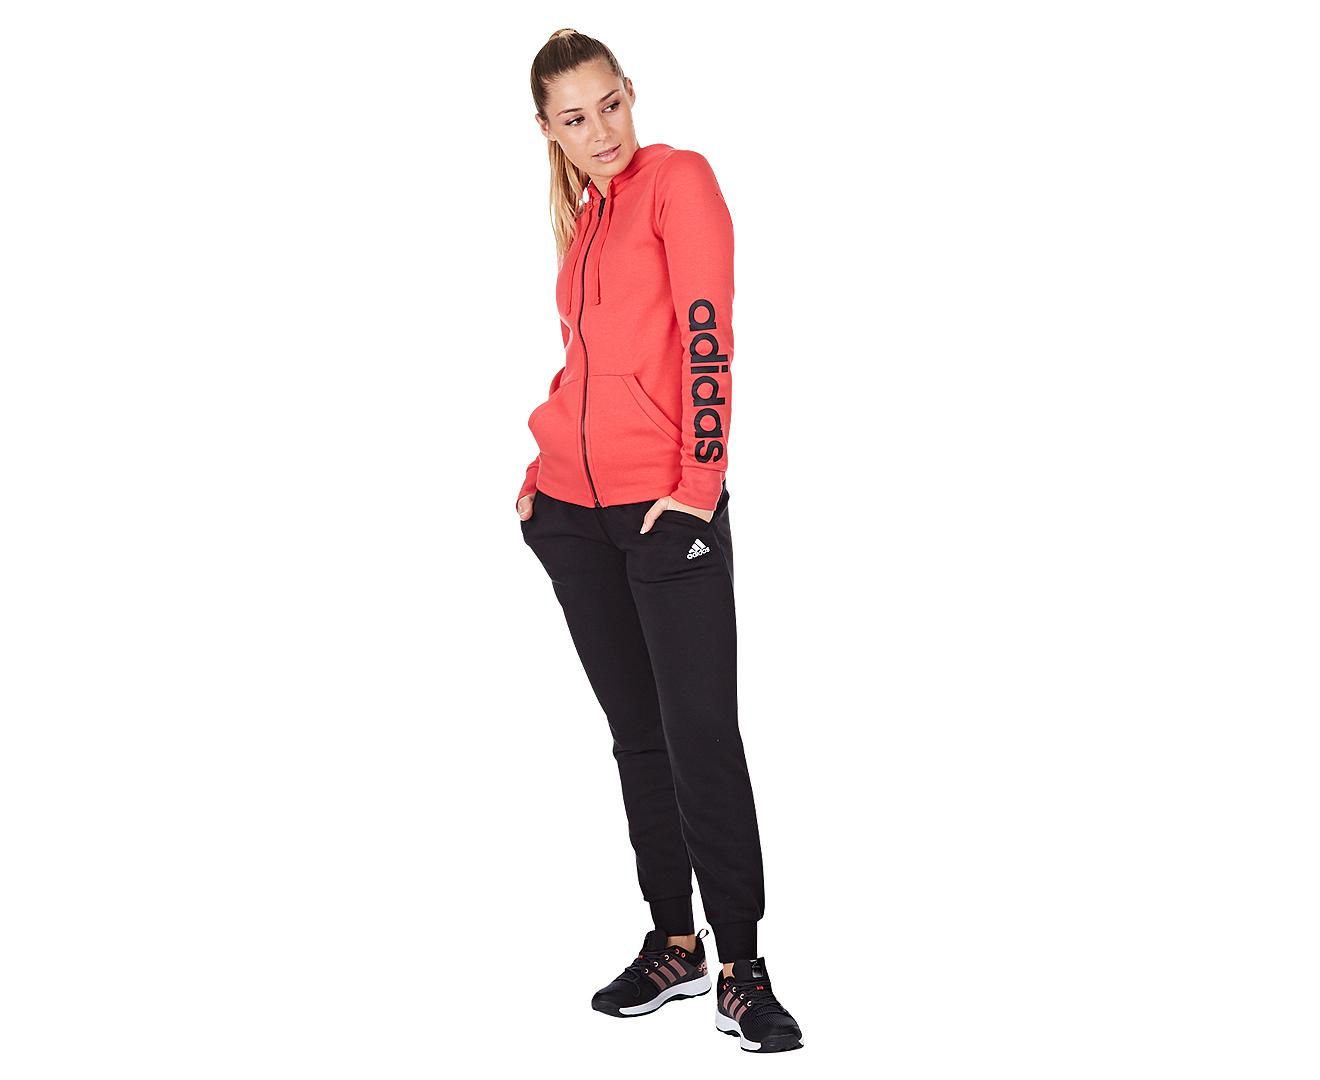 Adidas Women's Essentials Solid Pant BlackWhite